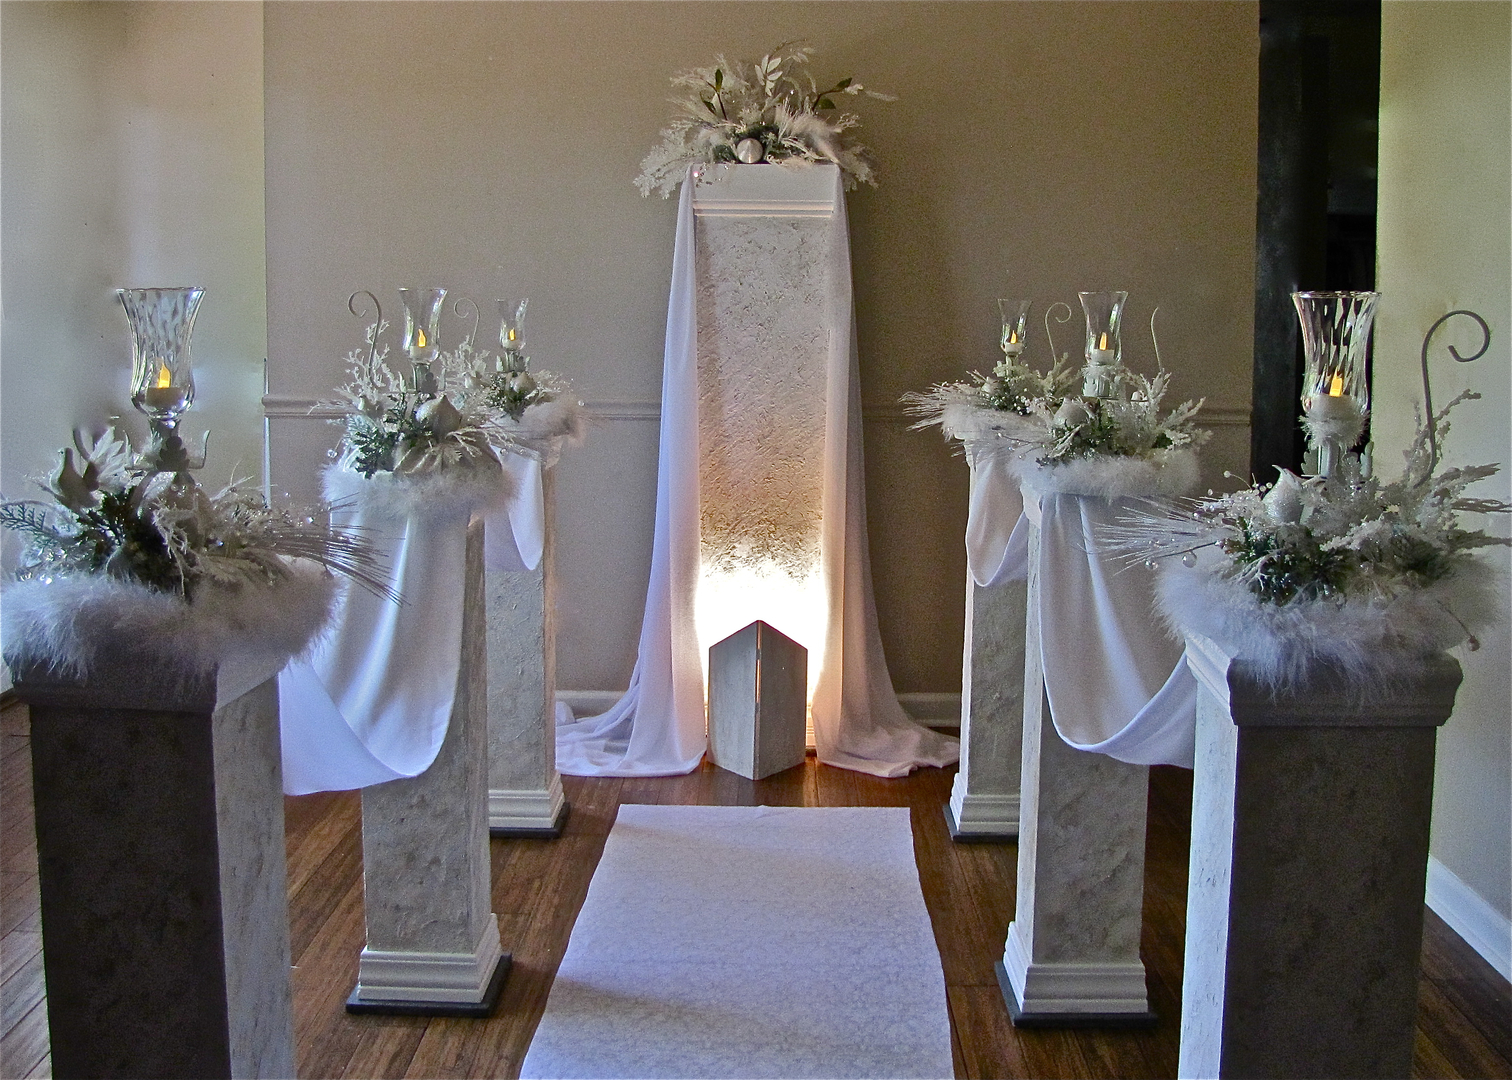 Rent Six Aisle Pillars An Altar Pillar With Florals Draping For 400 Under